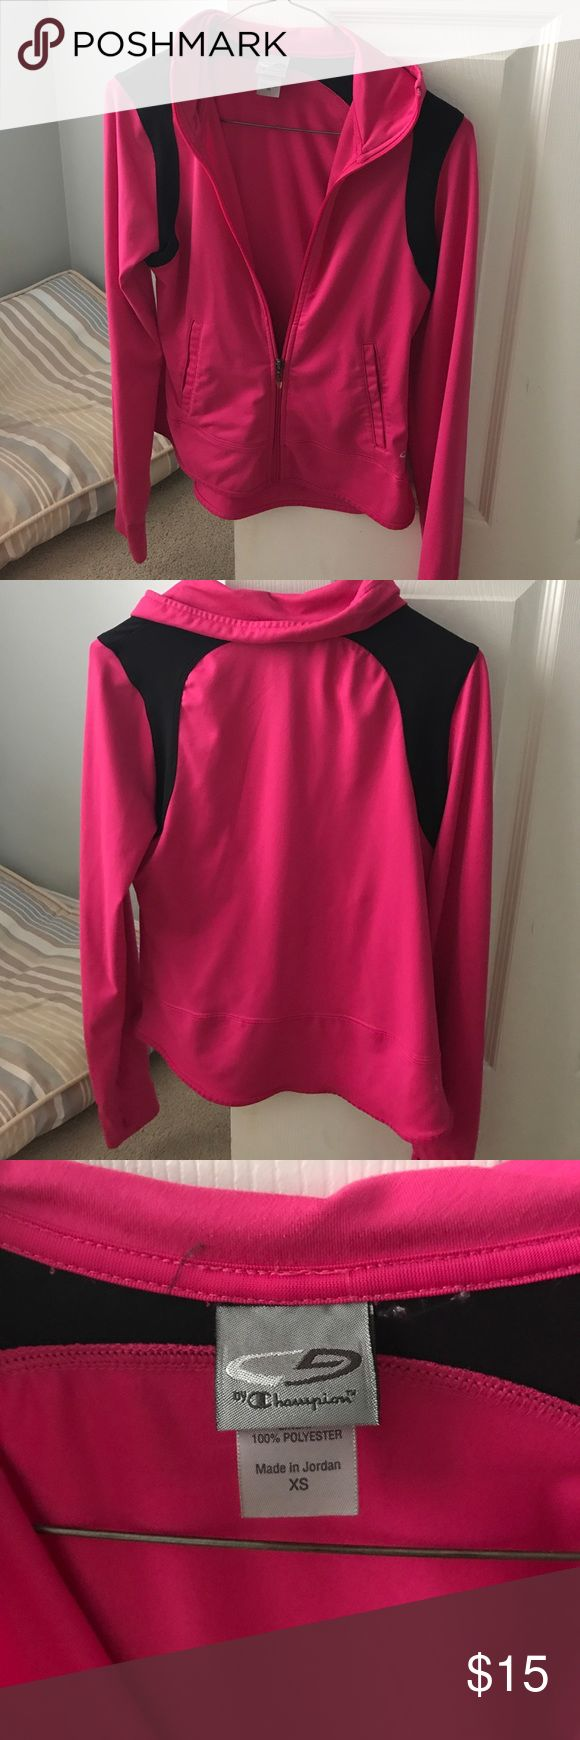 Champion pink zip up jacket Champion zip up pink and black zip up jacket. Champion Jackets & Coats